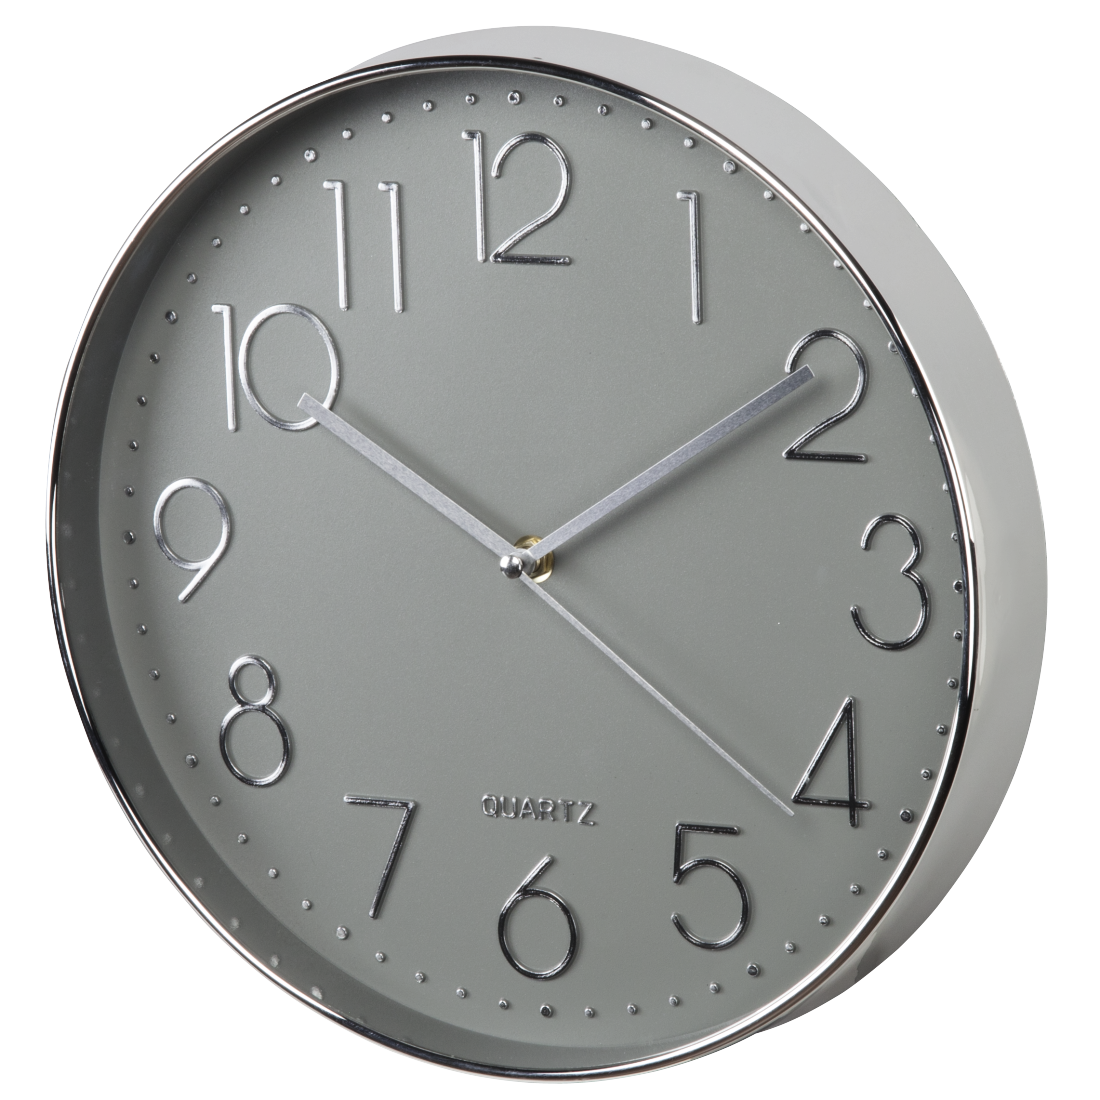 00176904 hama horloge murale elegance 30 cm silencieuse argent e grise for Horloge grise